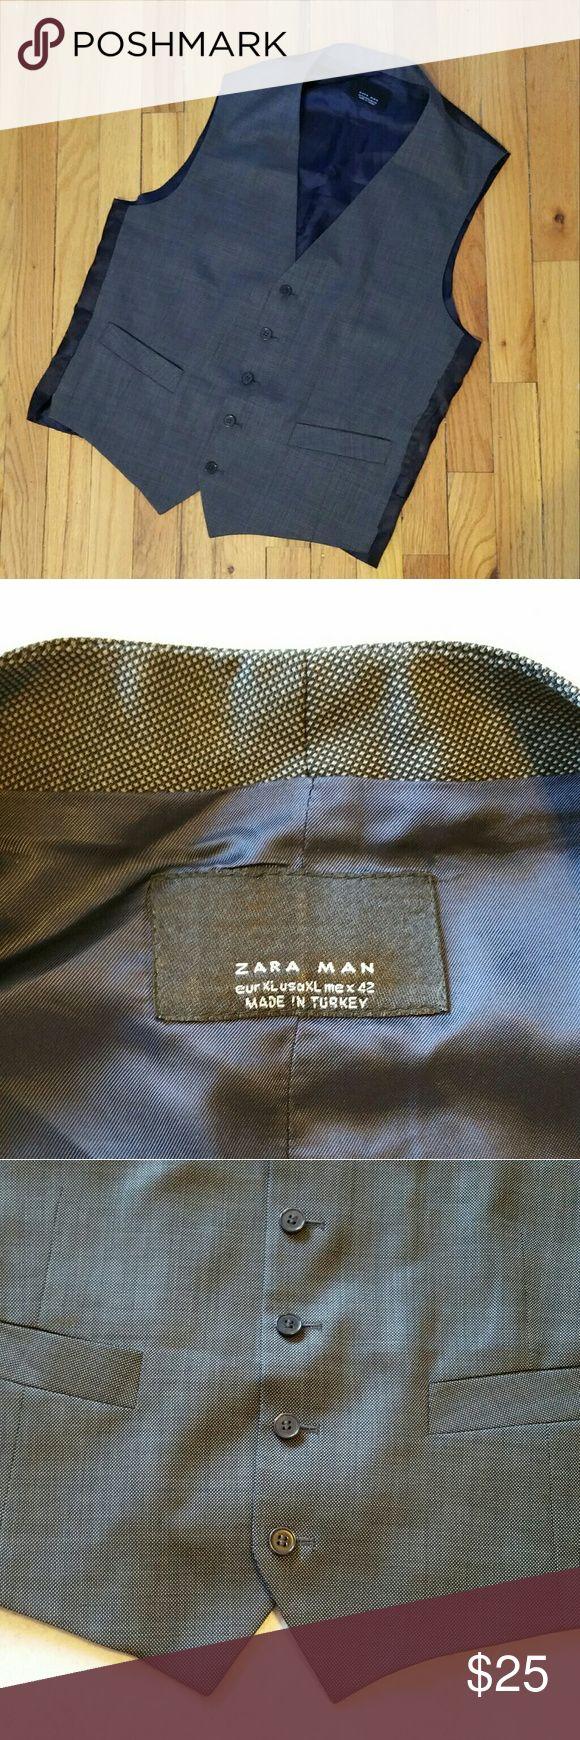 Zara Man Vest Like new! Zara Man vest. Gray and navy back. 2 pockets in front. Size XL.  Make an offer! Zara Suits & Blazers Vests